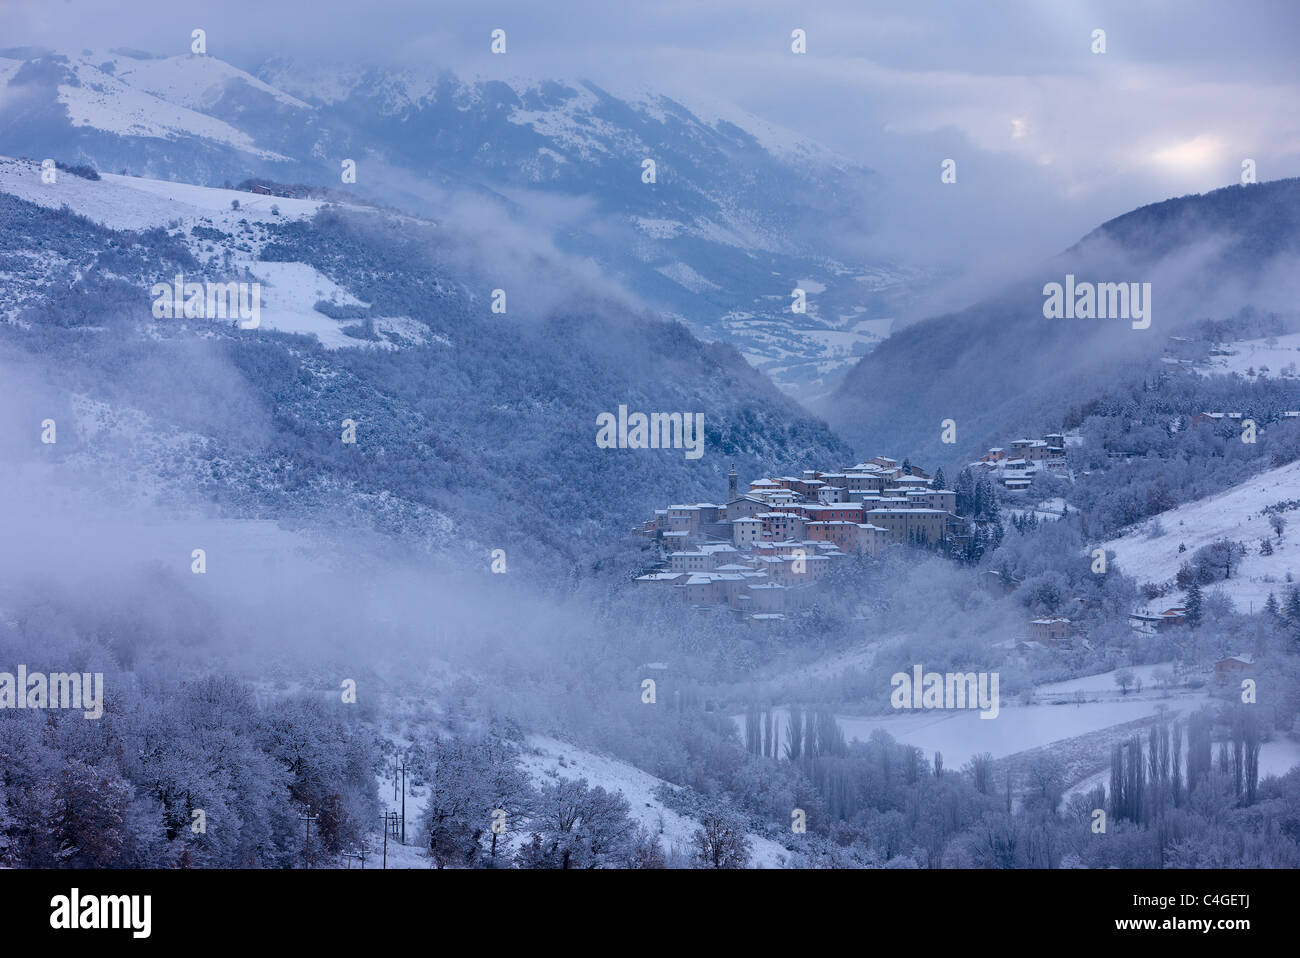 Preci in winter, Valnerina, Monti Sibillini National Park, Umbria, Italy - Stock Image